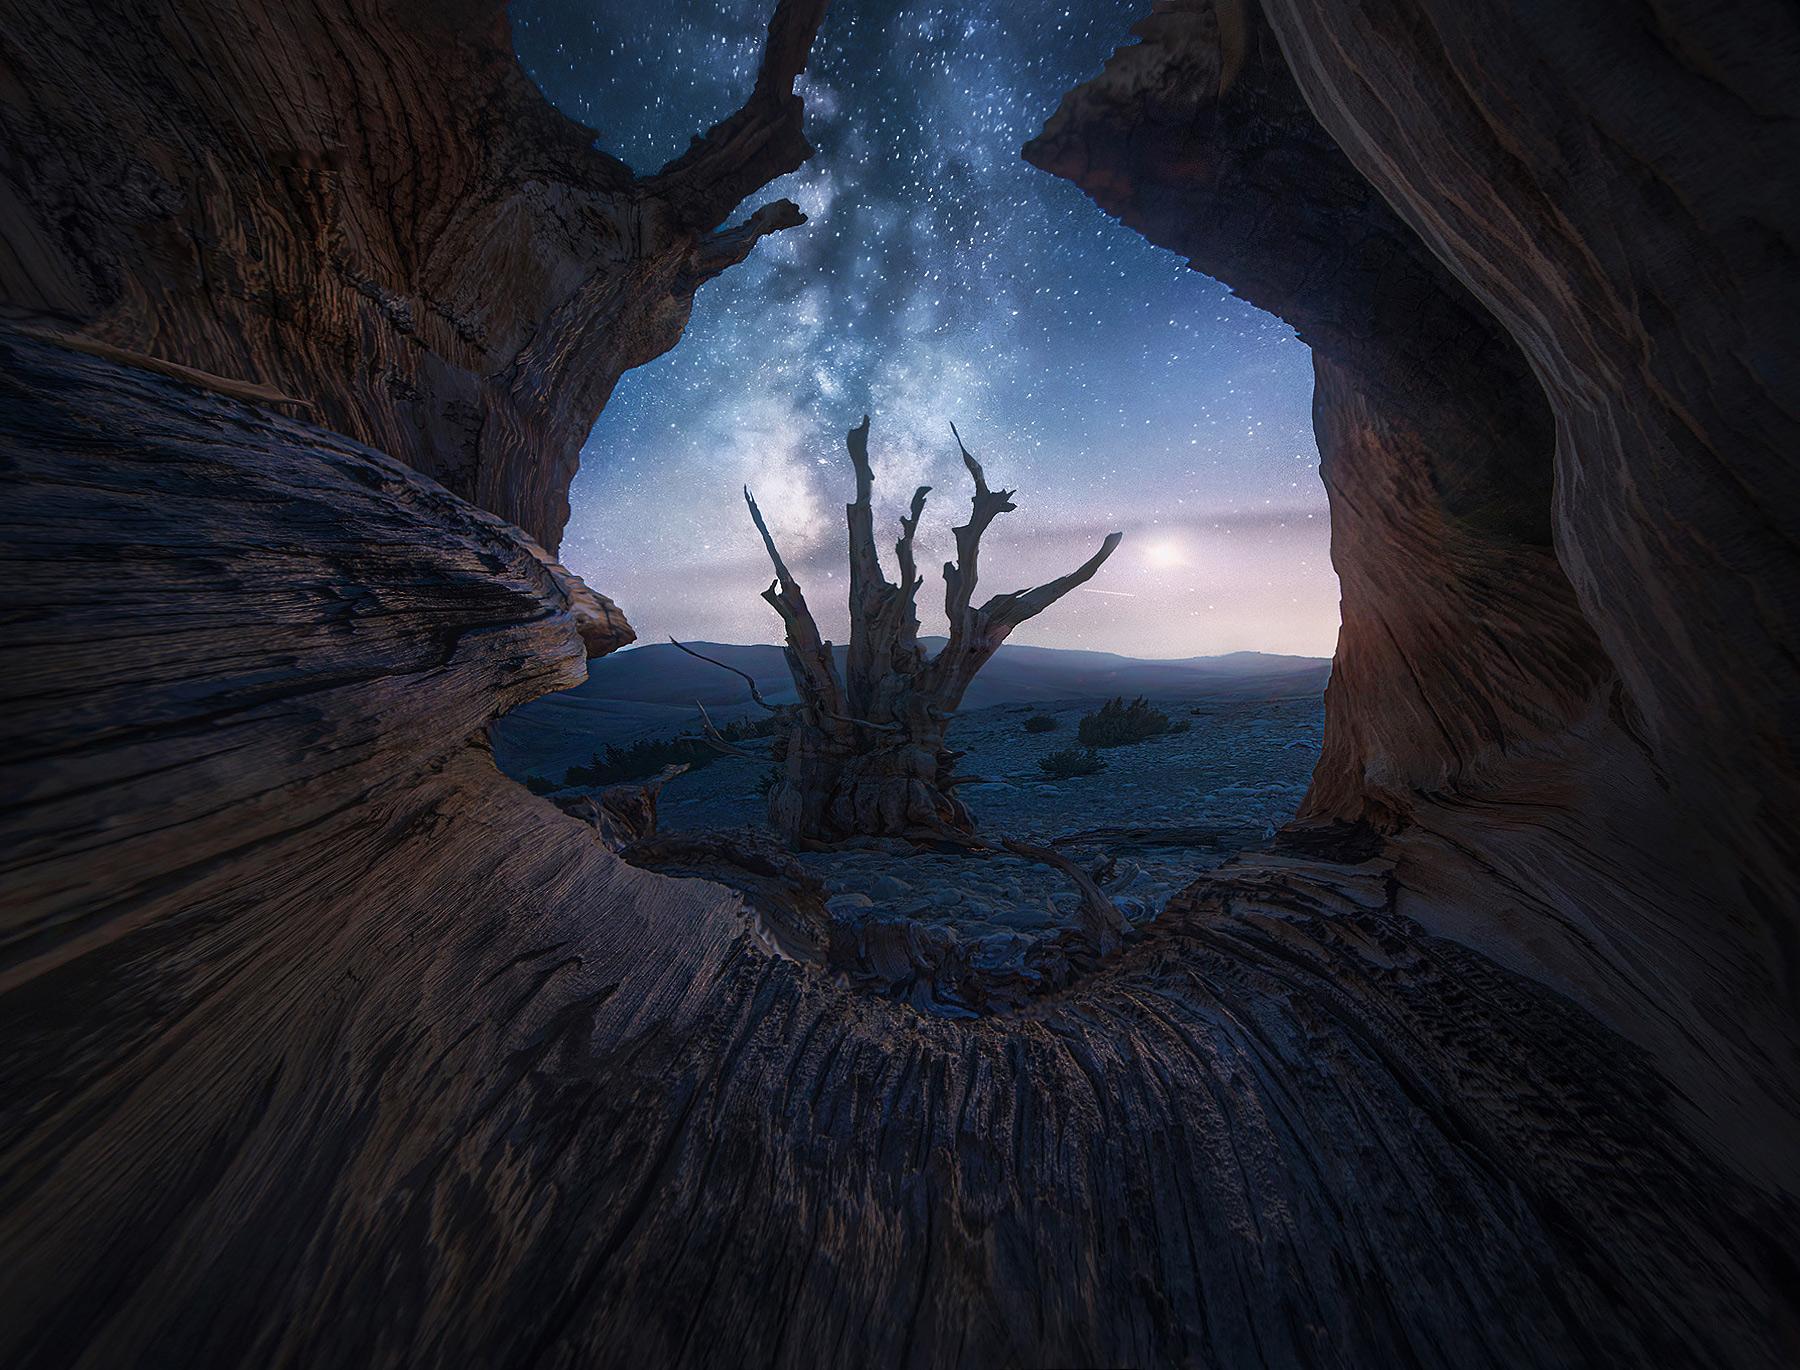 Bristlecone, night, sky, California, Milky Way, moon, photo